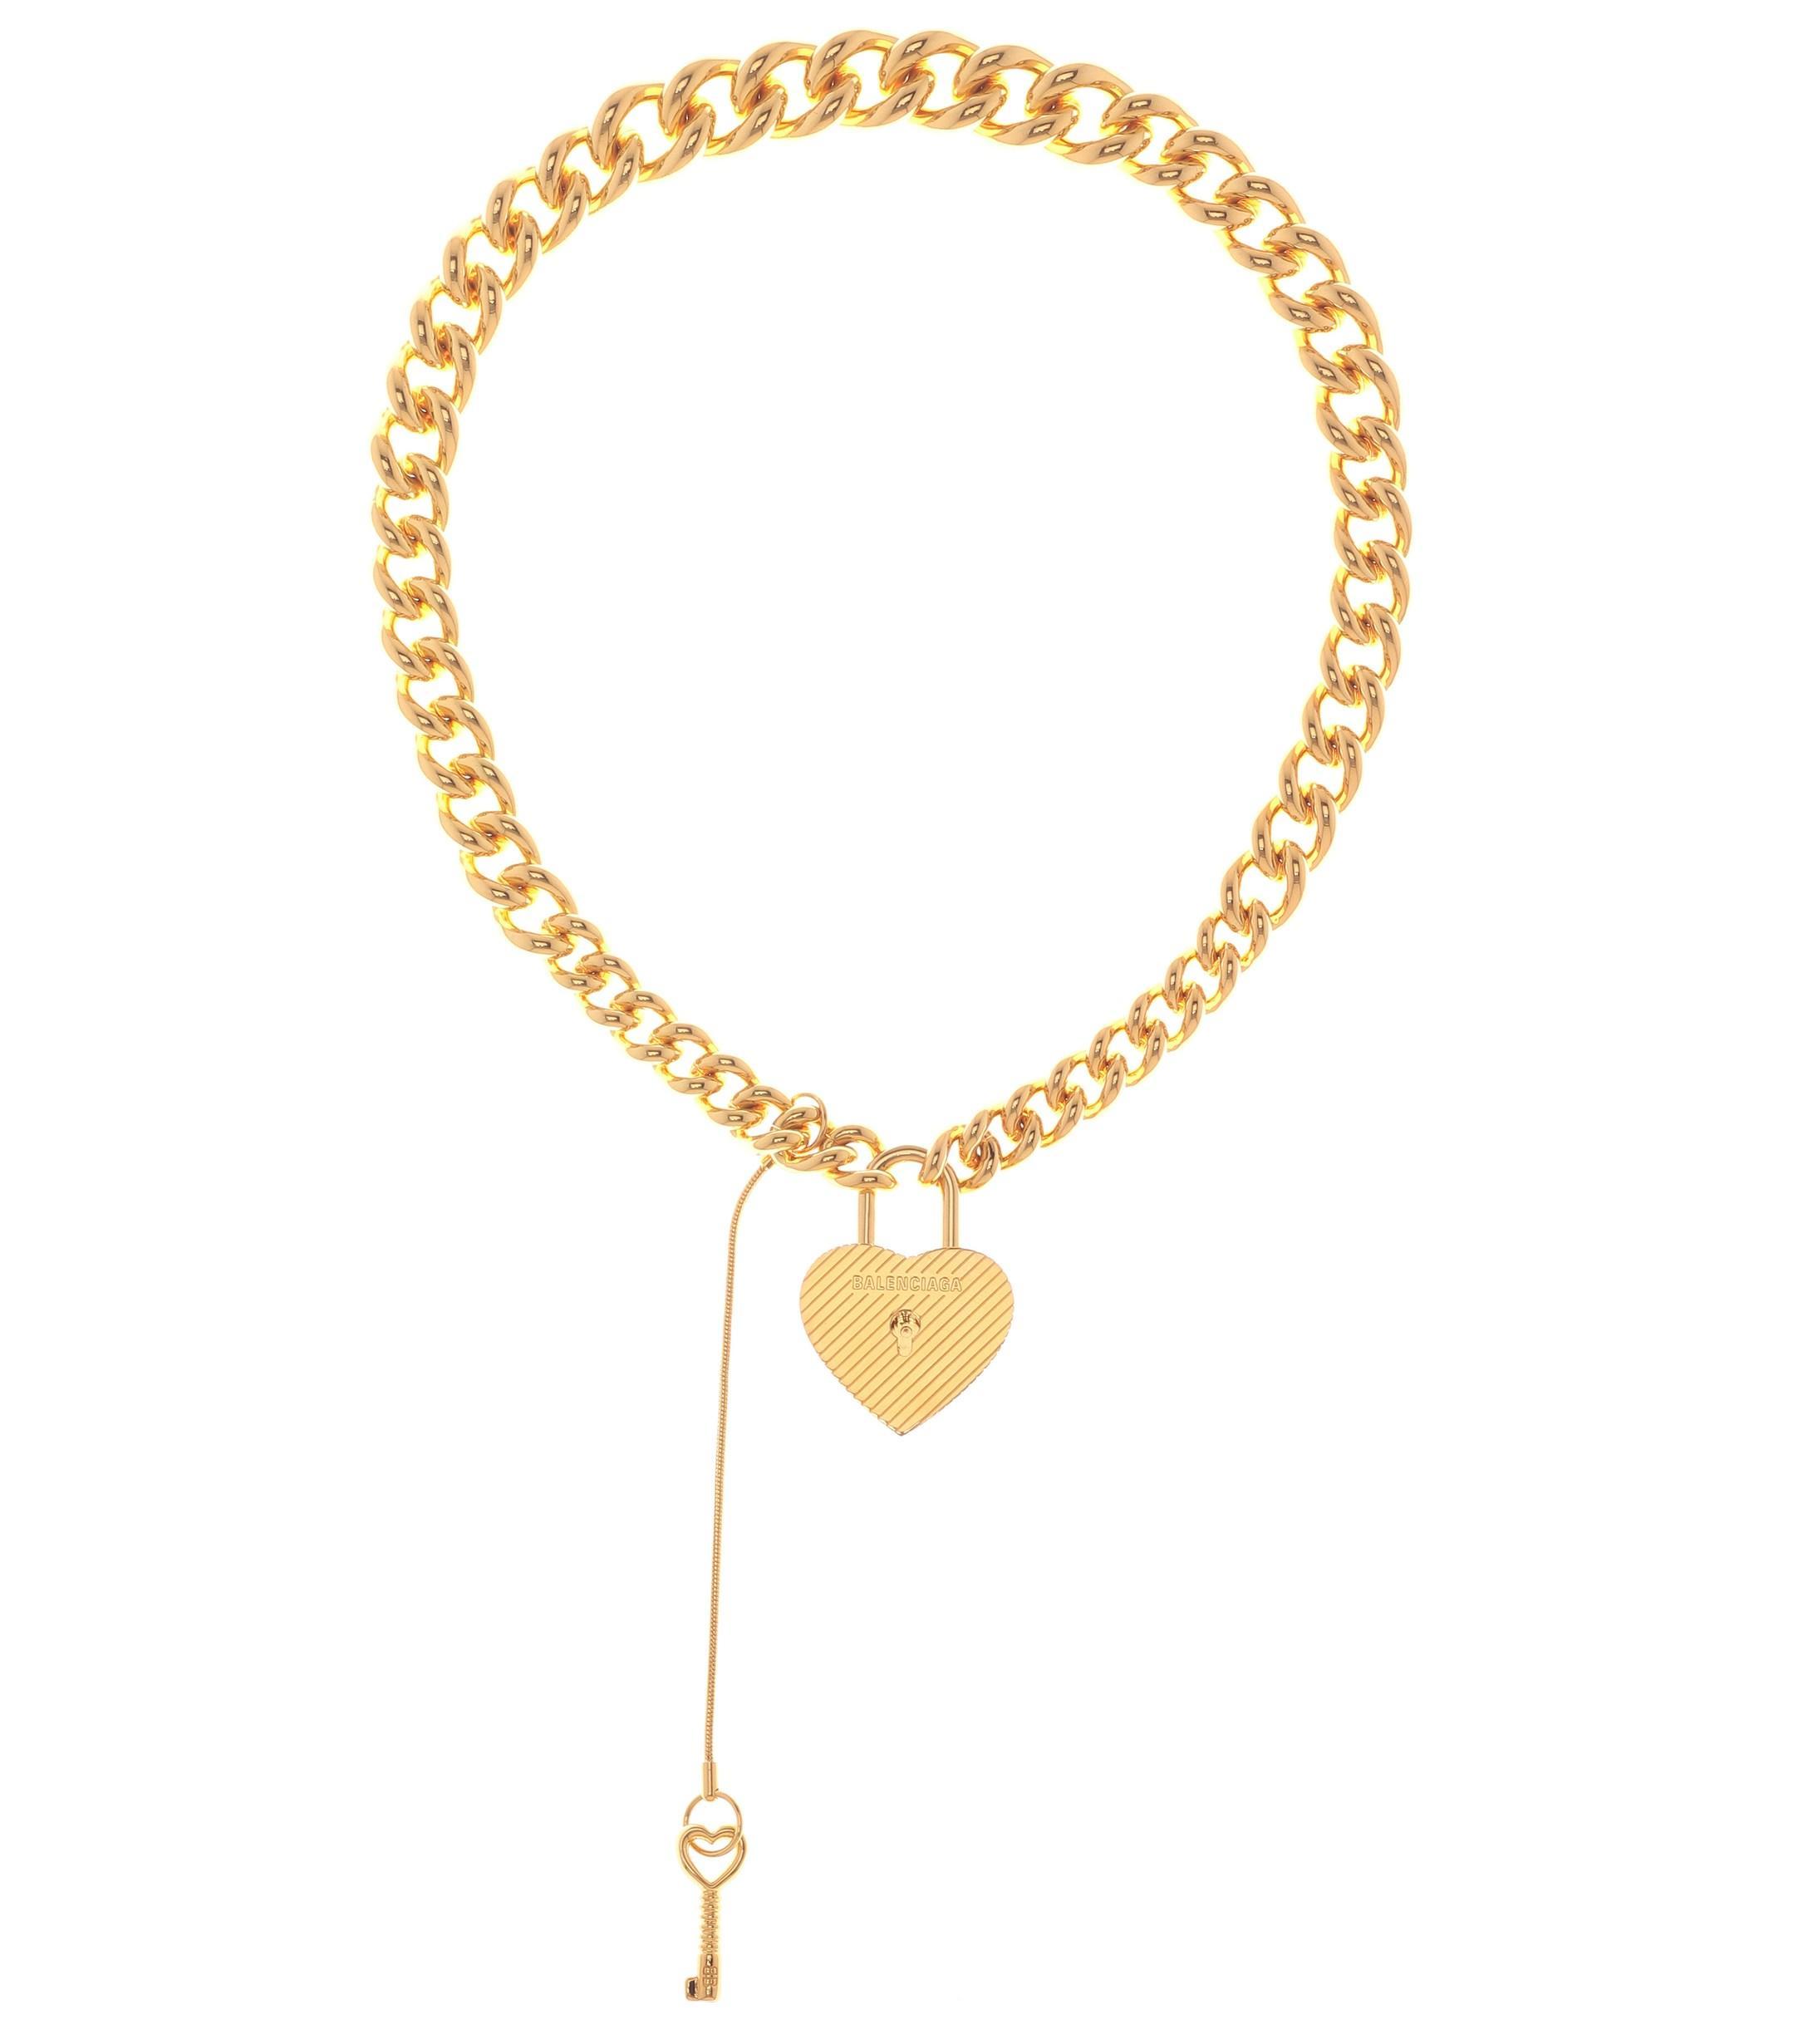 5a138624f4d8d Balenciaga Metallic Chunky Metal Necklace